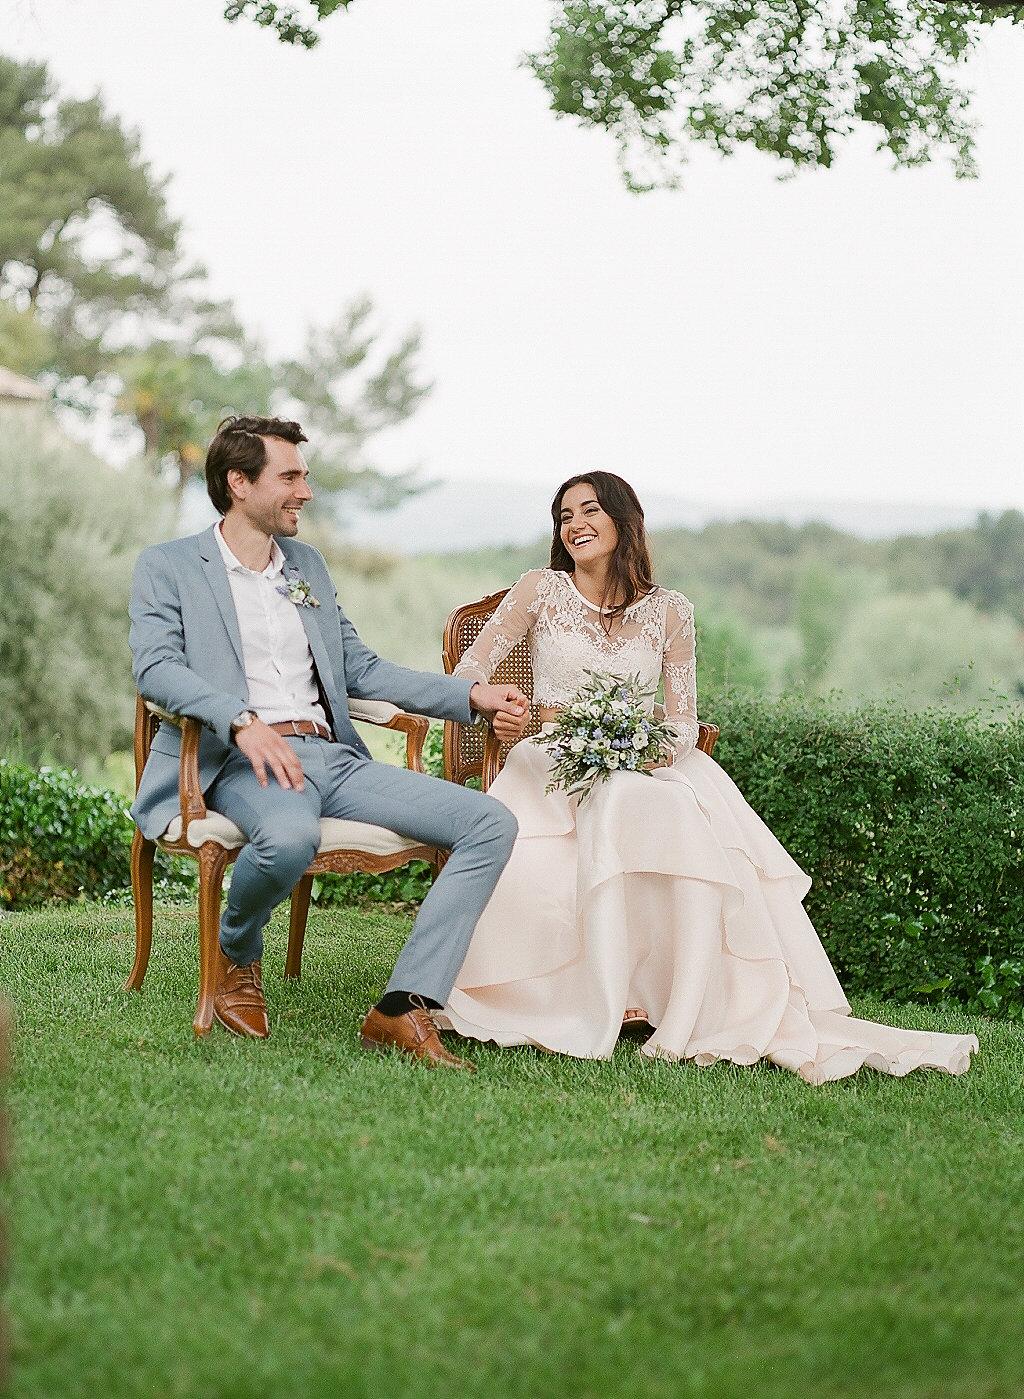 le coeur dans les etoiles - wedding planner - provence - luberon - alpilles - drome - vaucluse - sardaigne - italie - organisation - mariage - shooting - dolce vita - valery villard-277